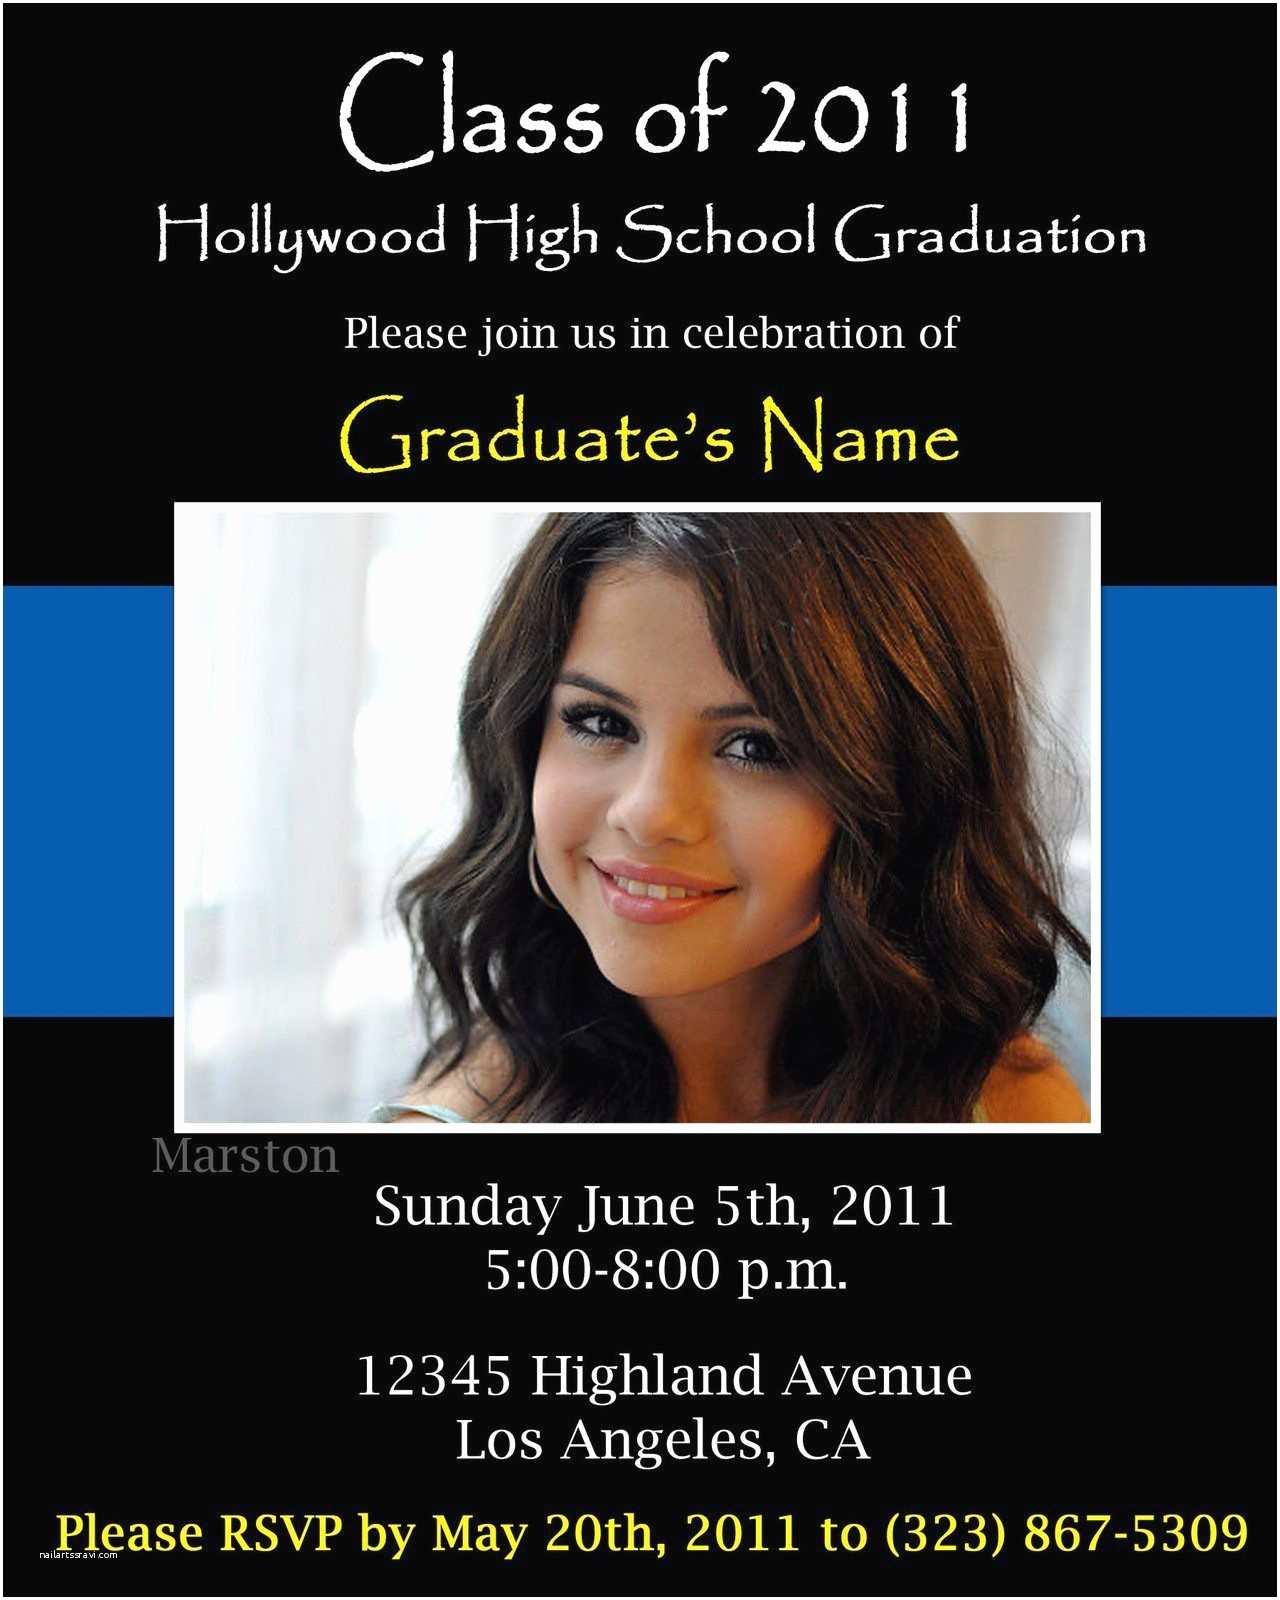 Free Graduation Invitations Graduation Invitation Graduation Invitation Templates